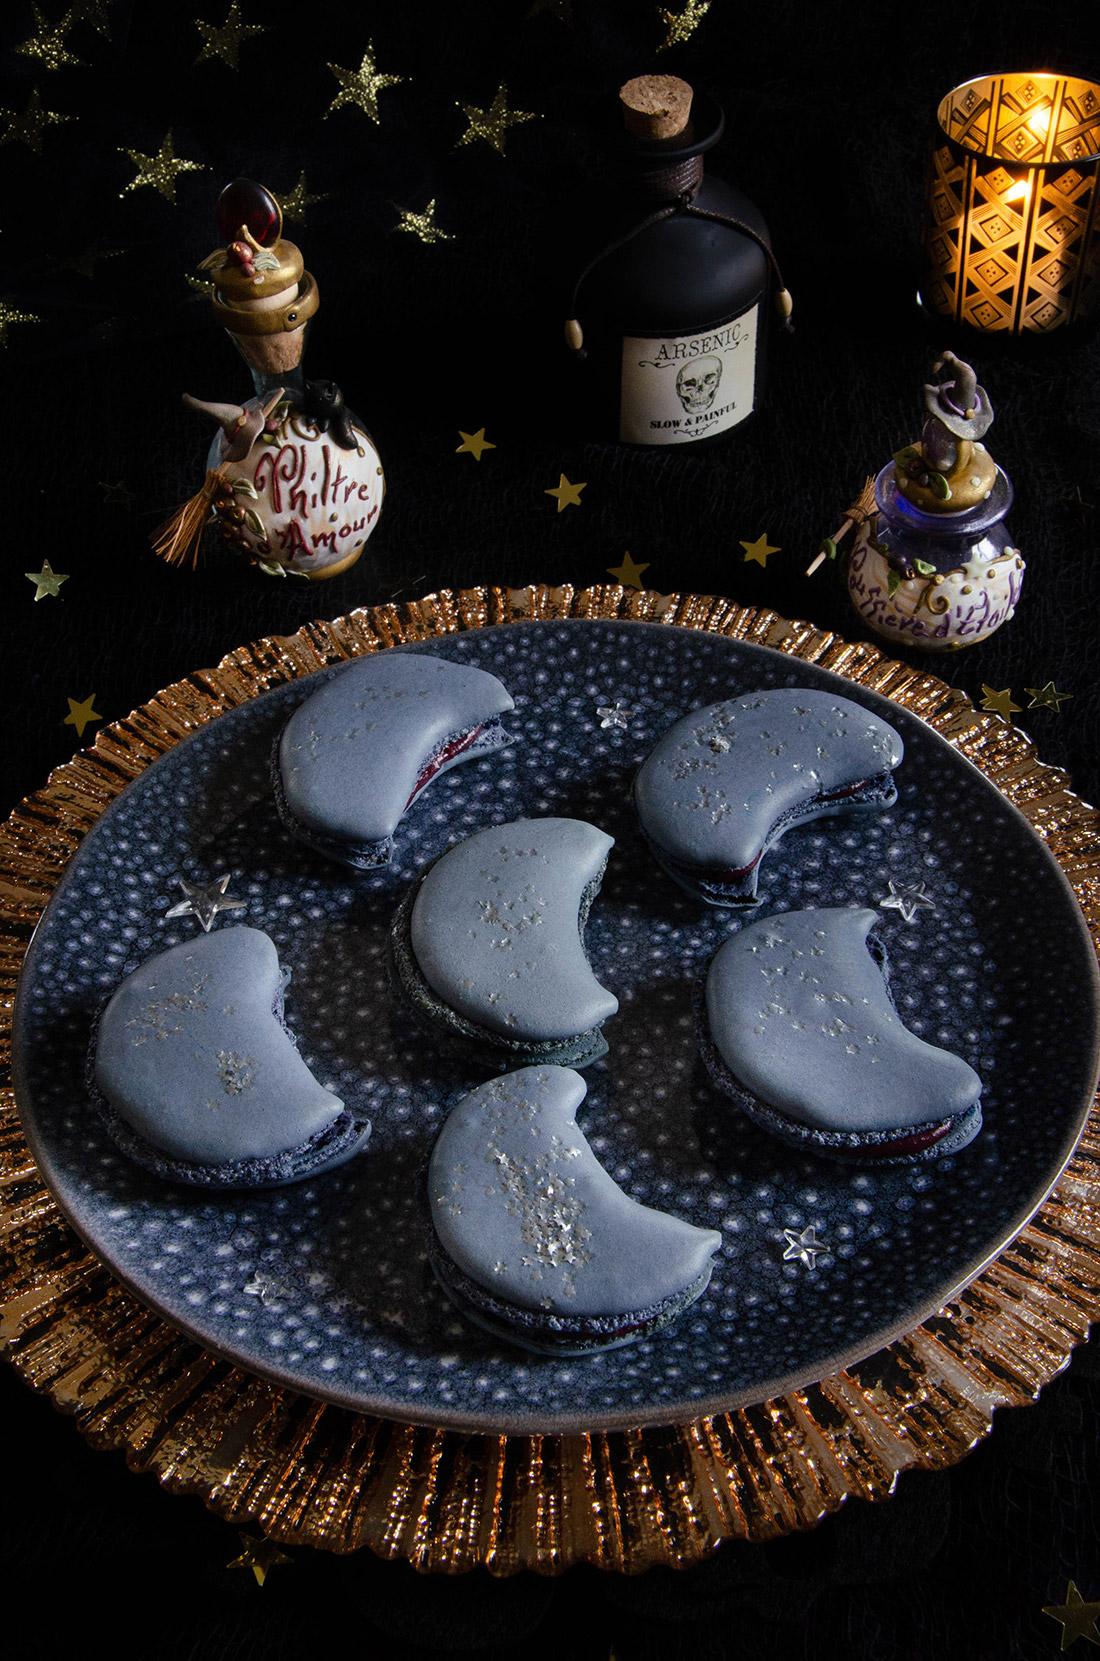 Macarons ganache cassis en forme de lune pour Halloween